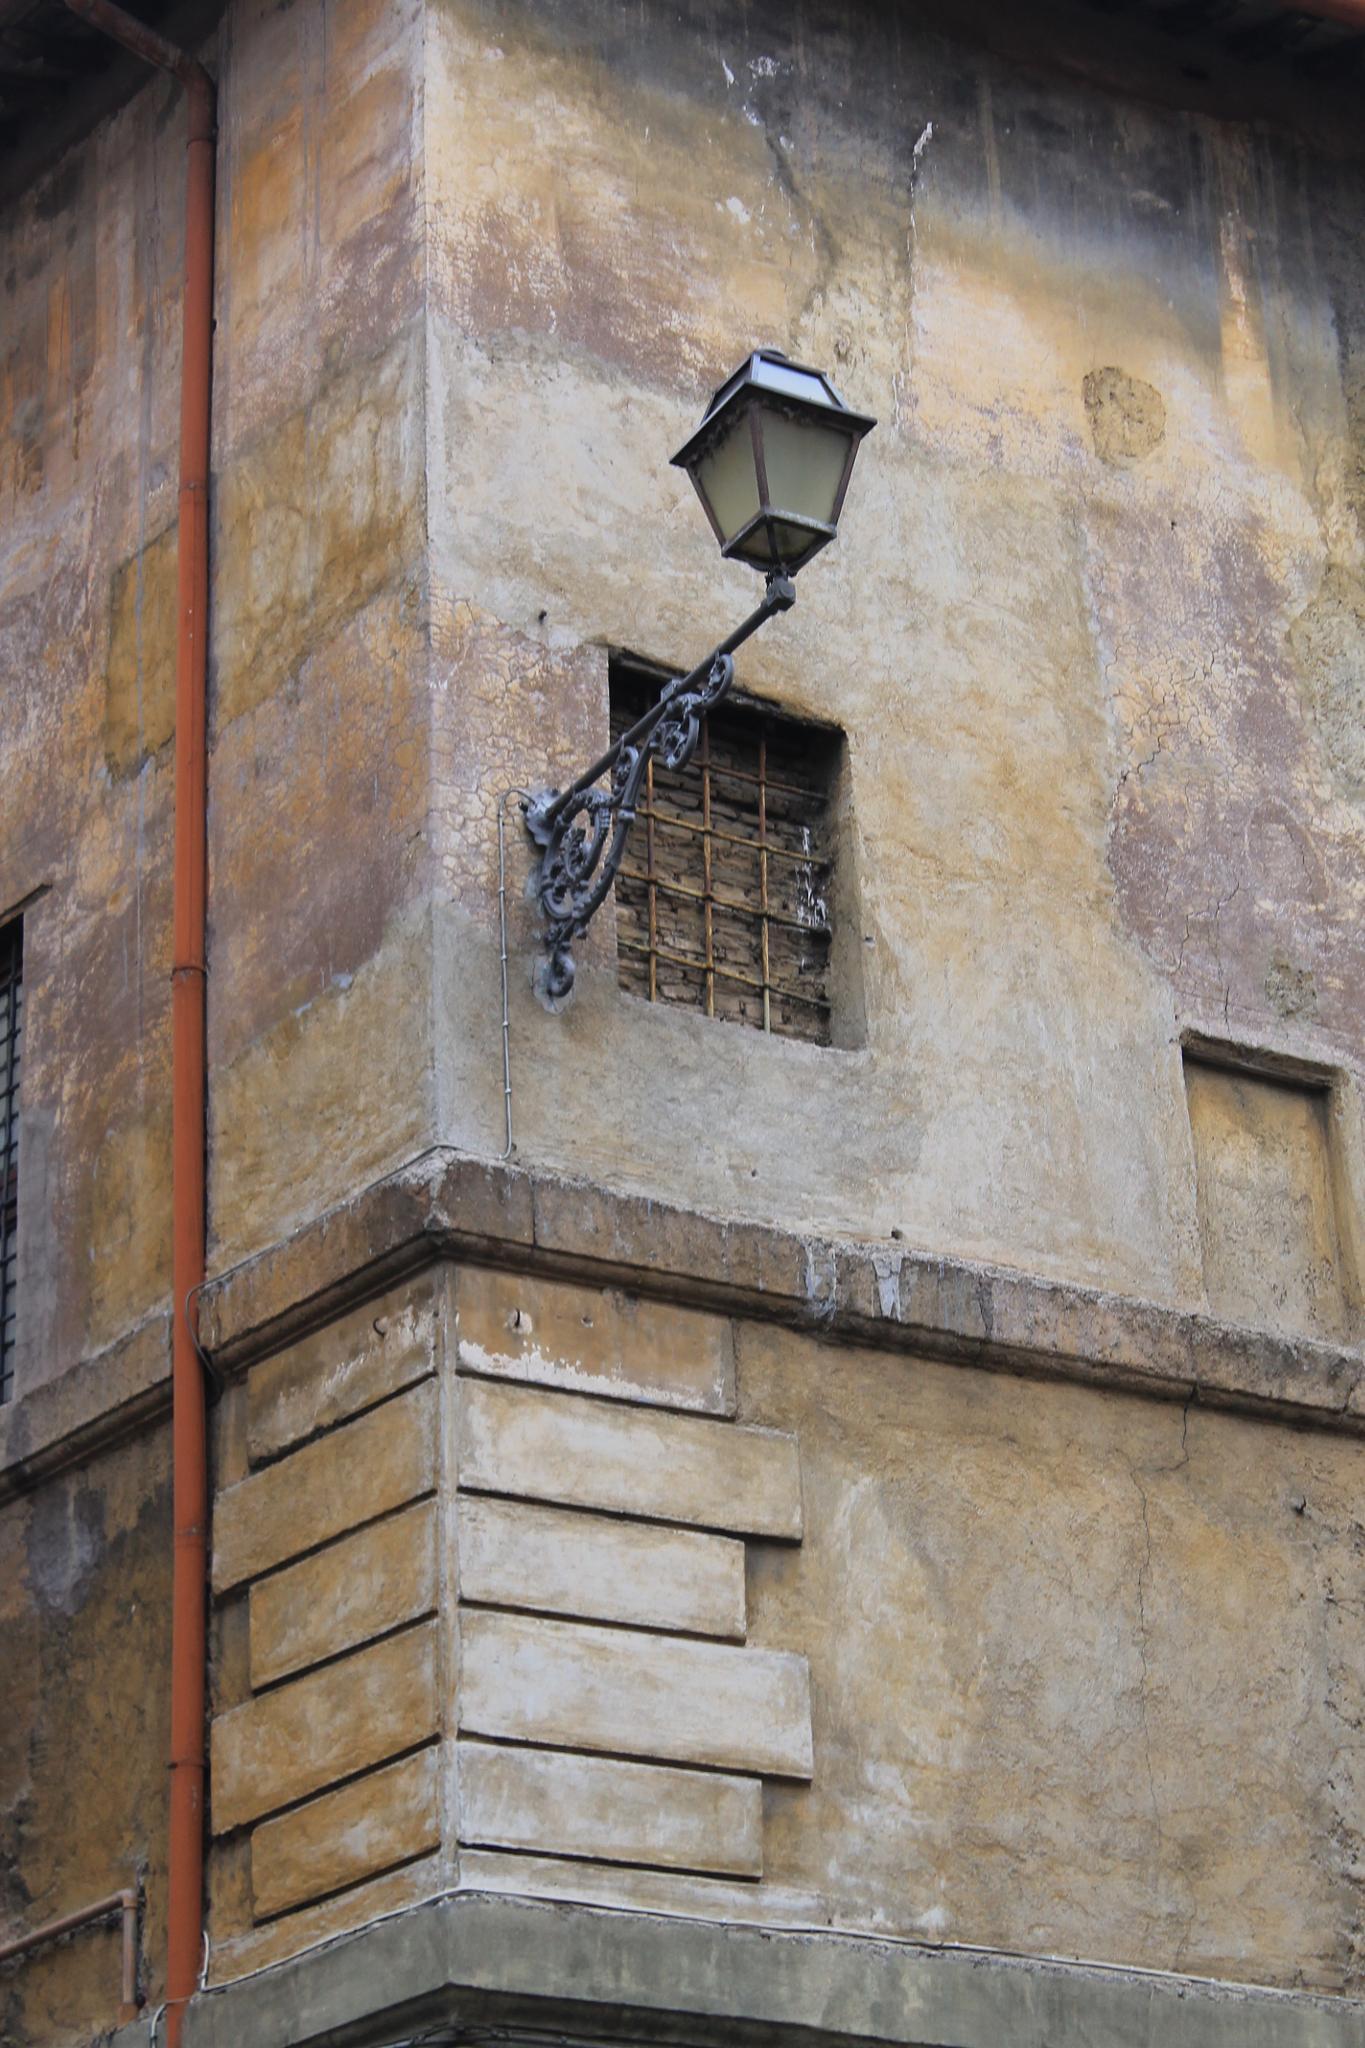 Lanterna & finestra by Salvatore Bertolino